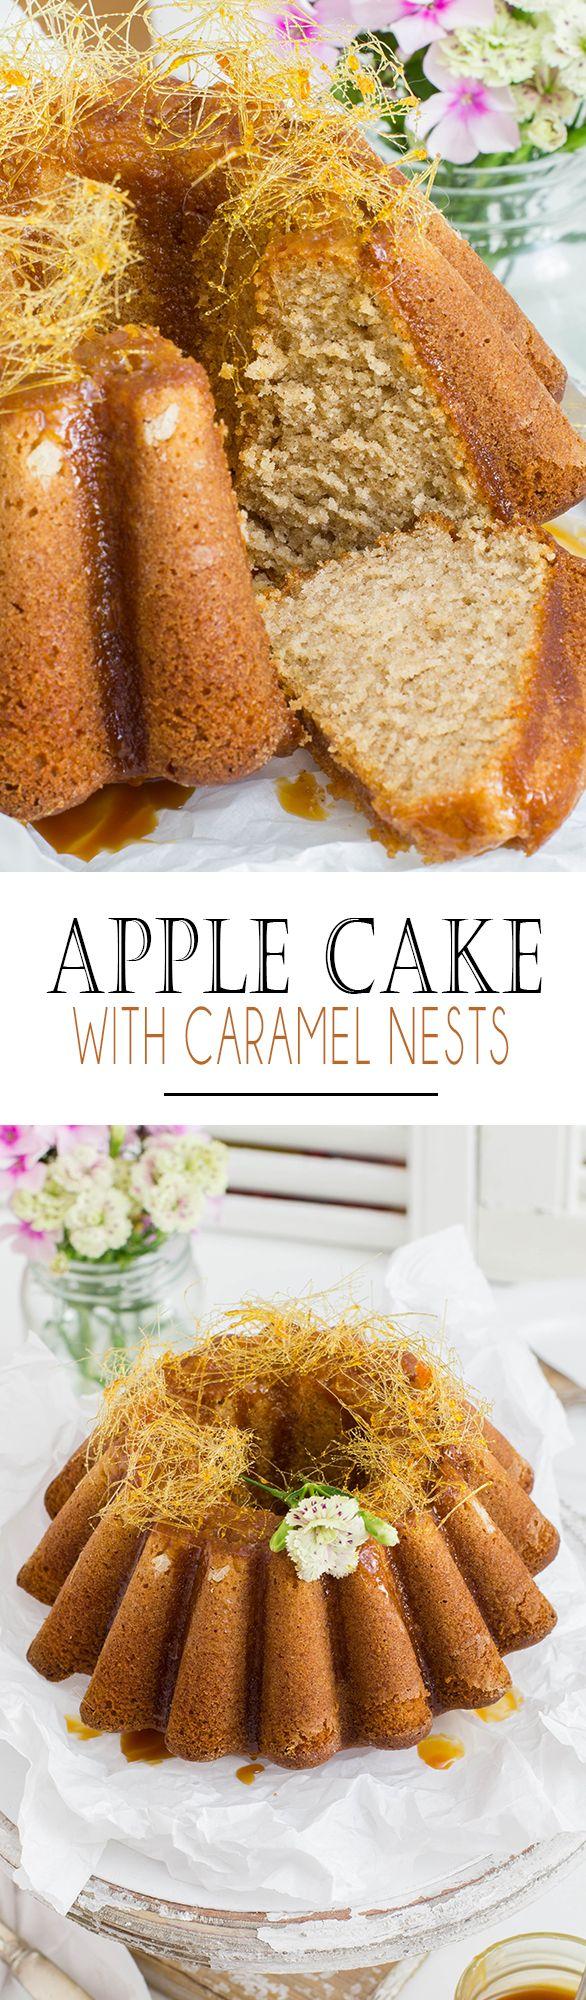 Apple Sponge Cake with salted caramel sauce and caramel nests | Apfel Rührkuchen mit salziger Karamellsauce und Karamellnestern